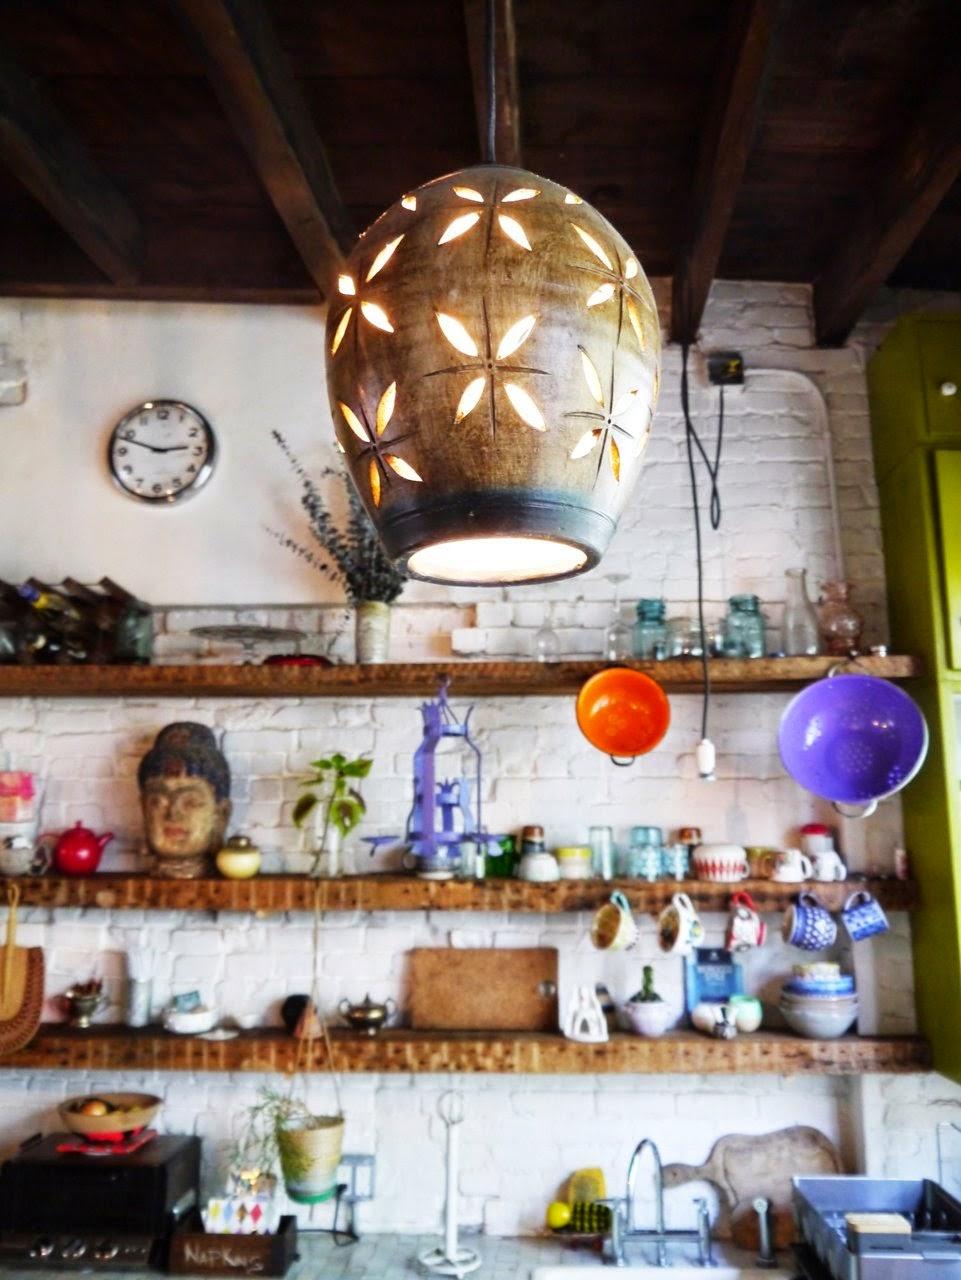 Eclectic+brooklyn+home+art+design+interior+kitchen+inspiration